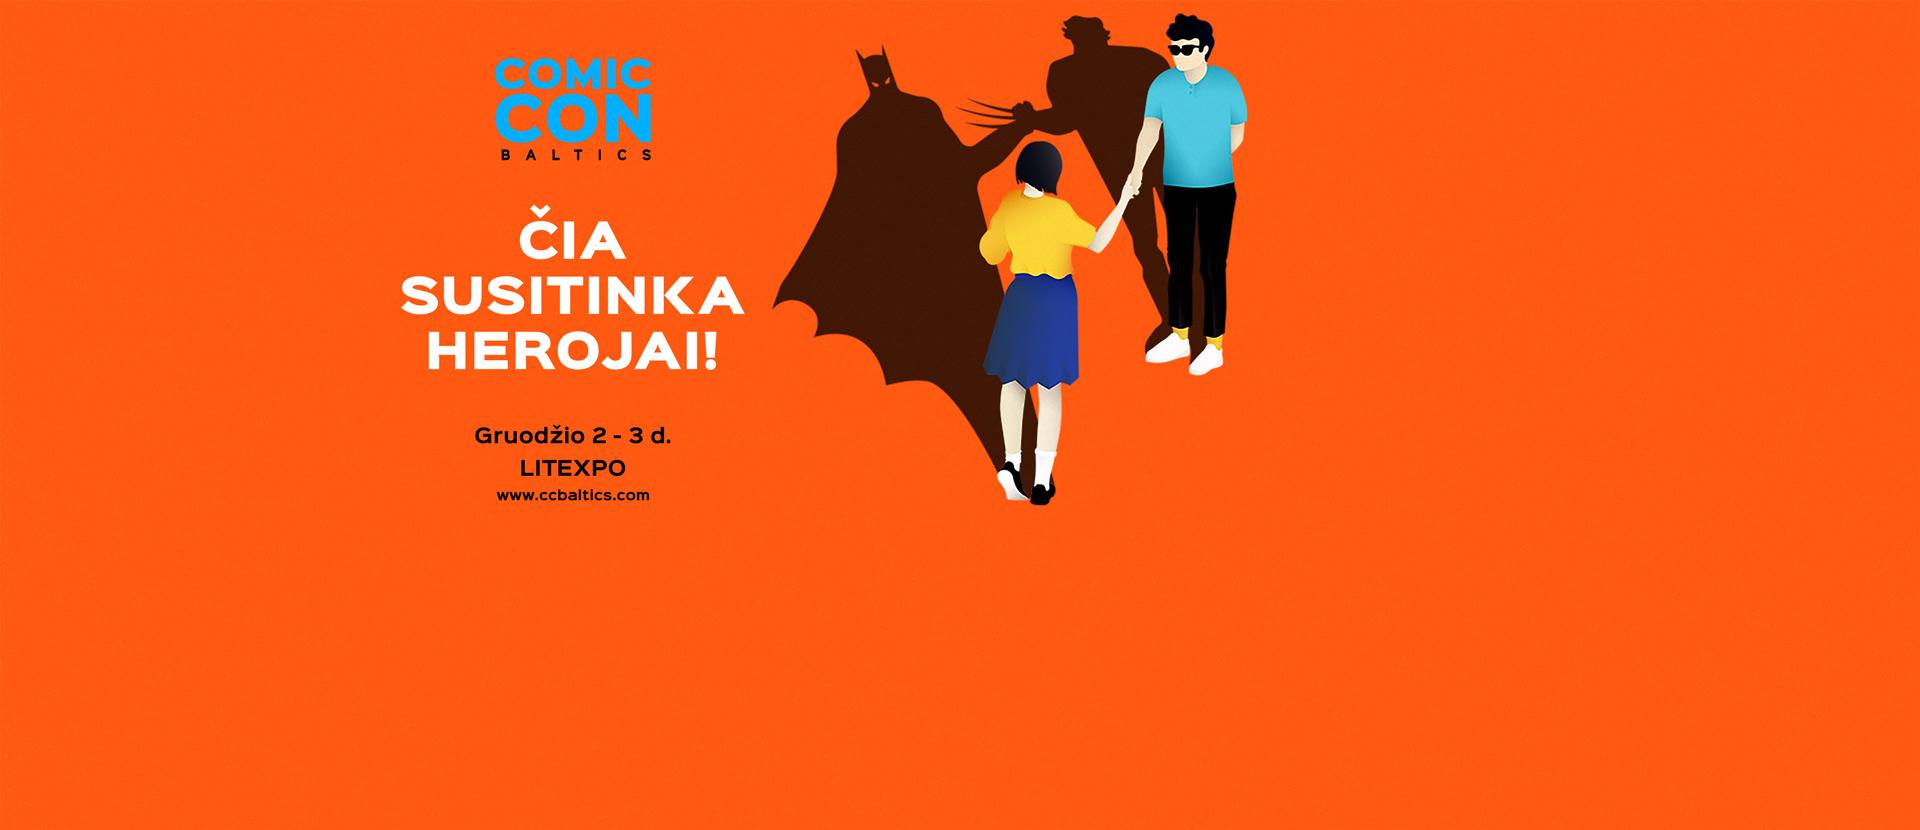 Comic Con Baltics – pop culture event